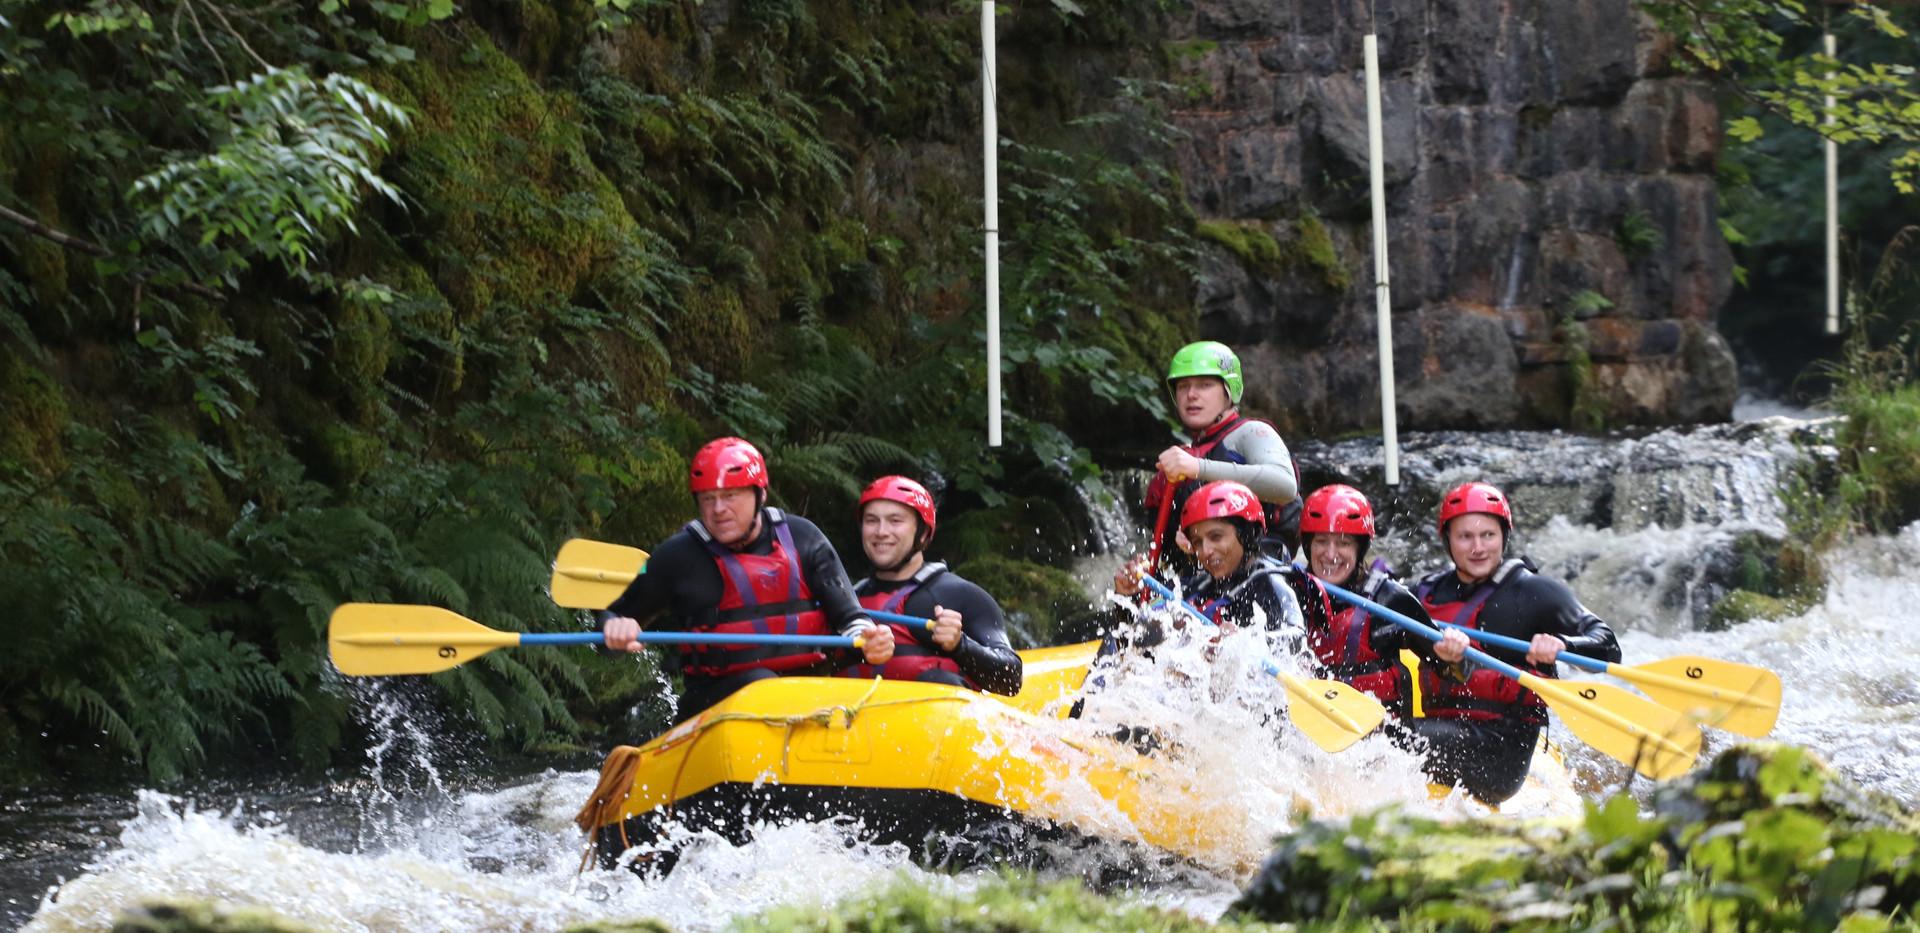 Snowdonia Whitewater Rafting & Hiking Trip, 2019 | Personal Training Group | Gym | Bishops Stortford | Harlow | Hertfordshire | Health | Exercise